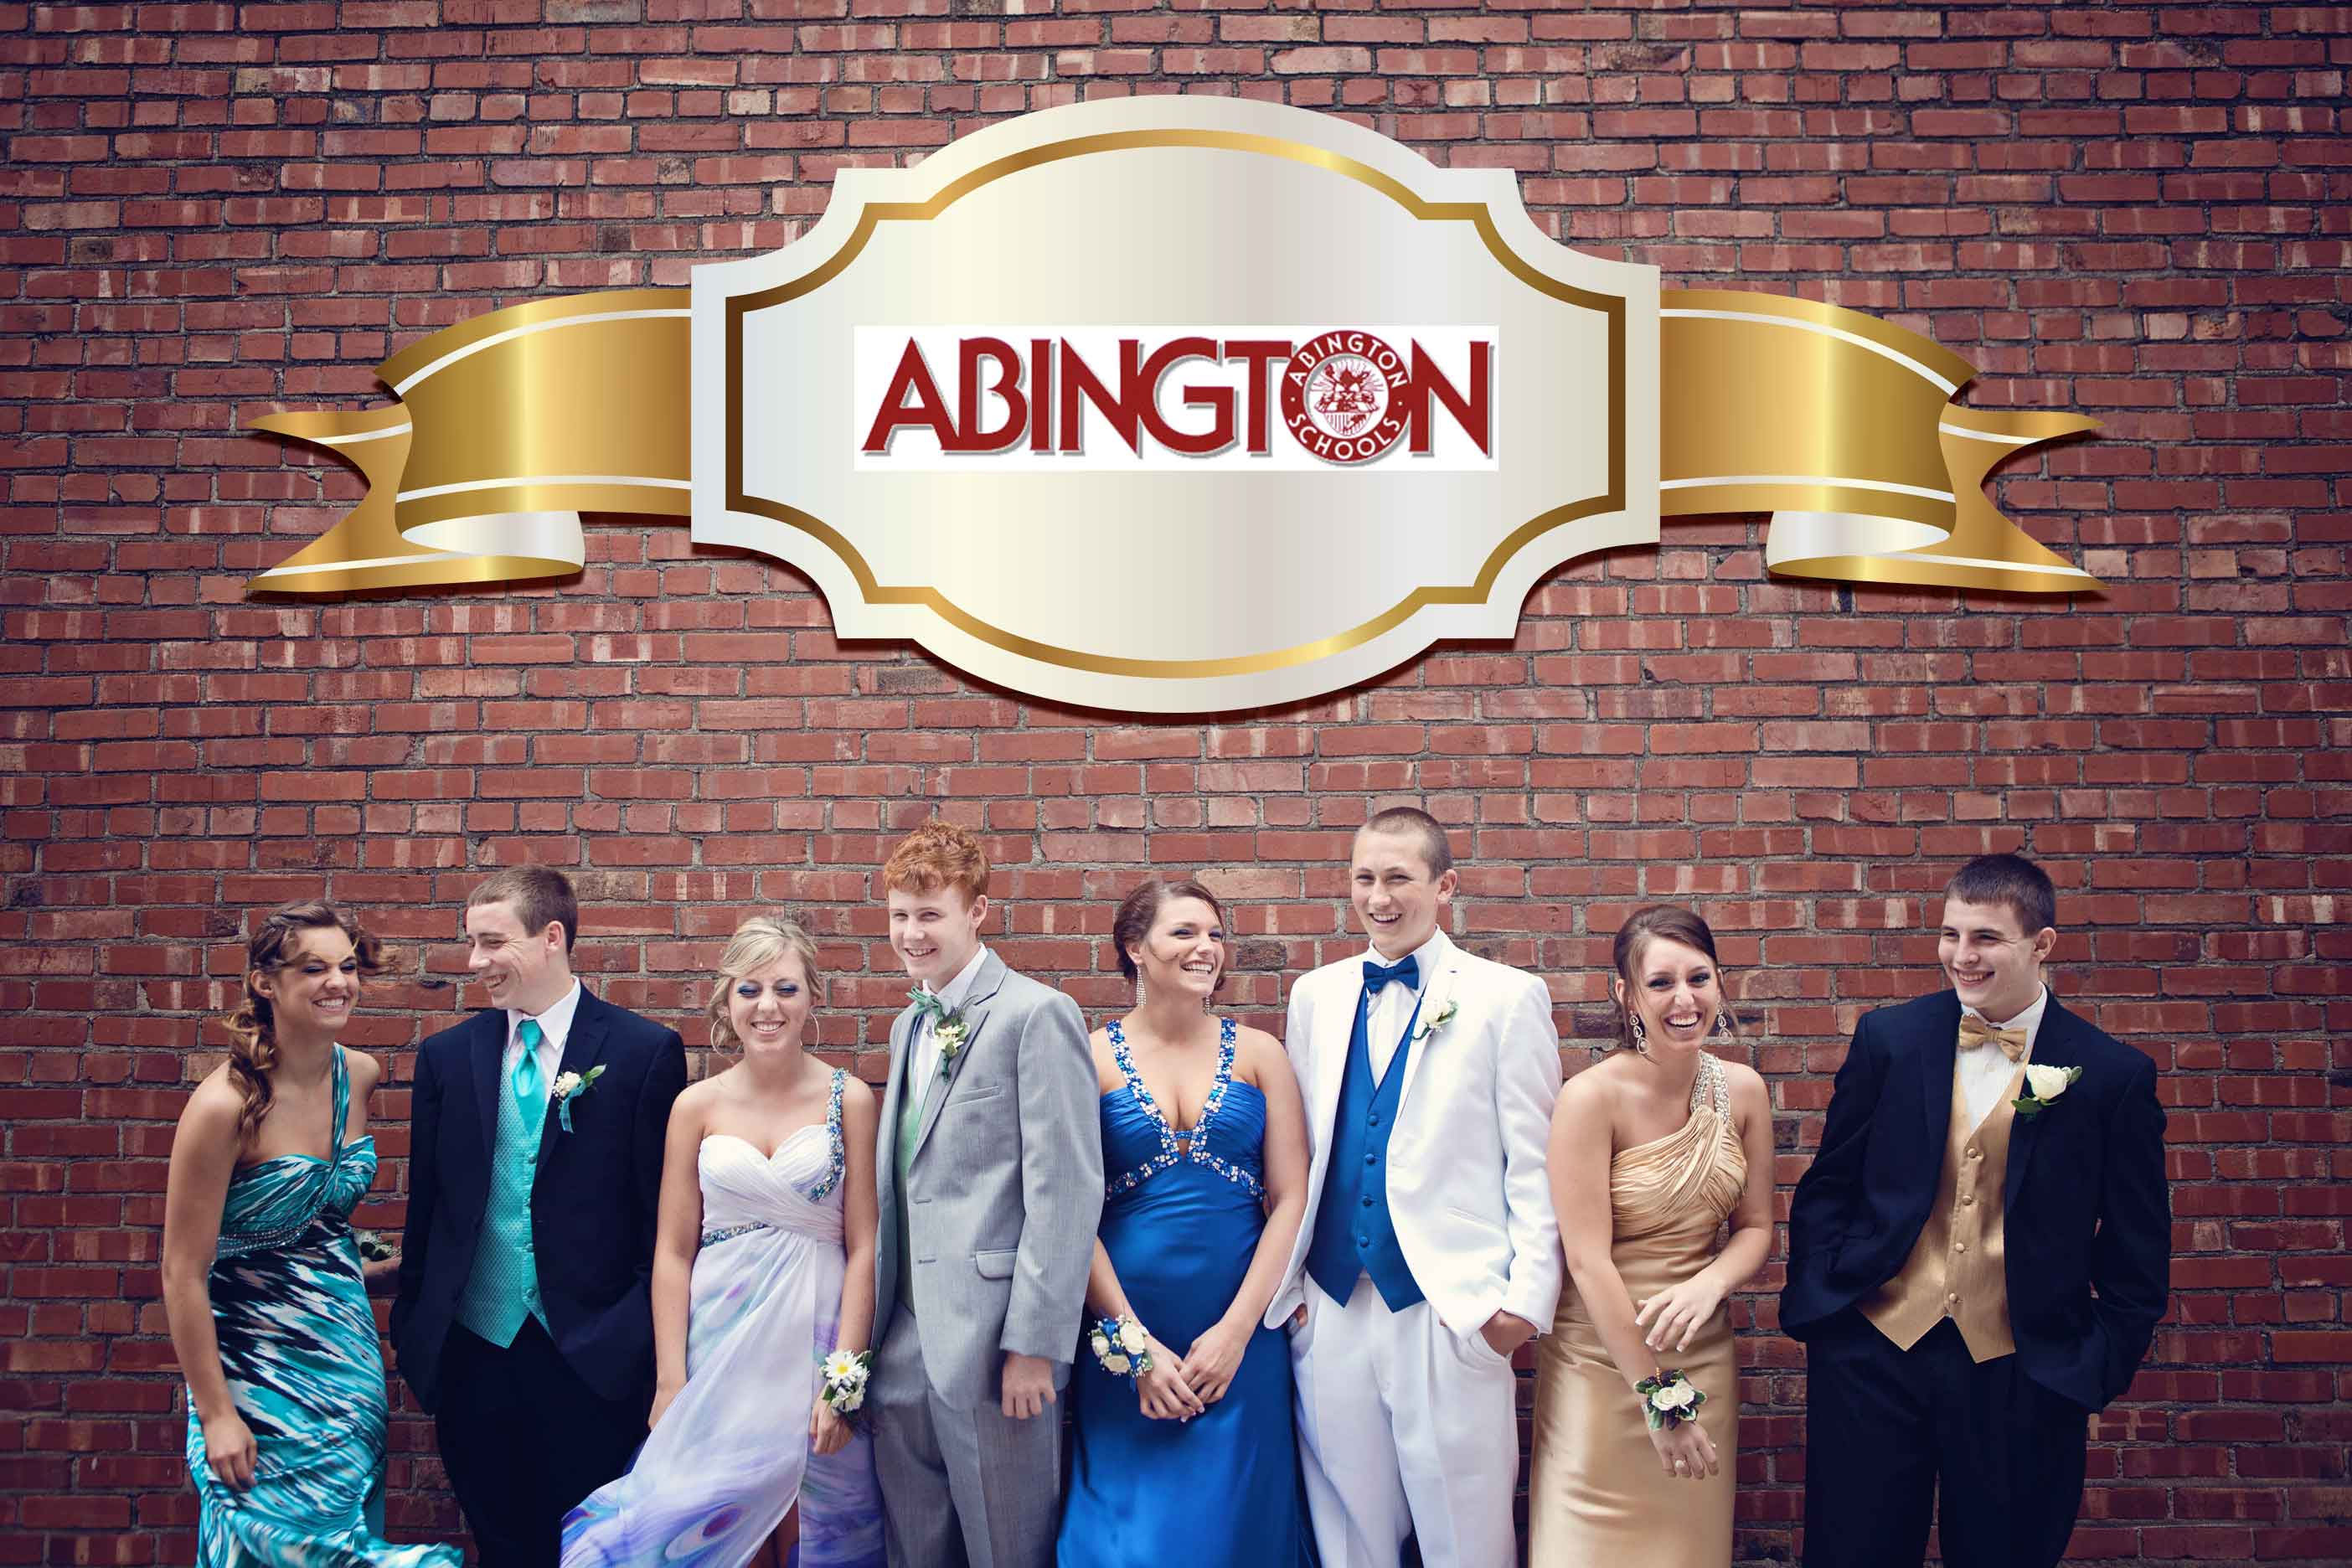 abington senior high school prom